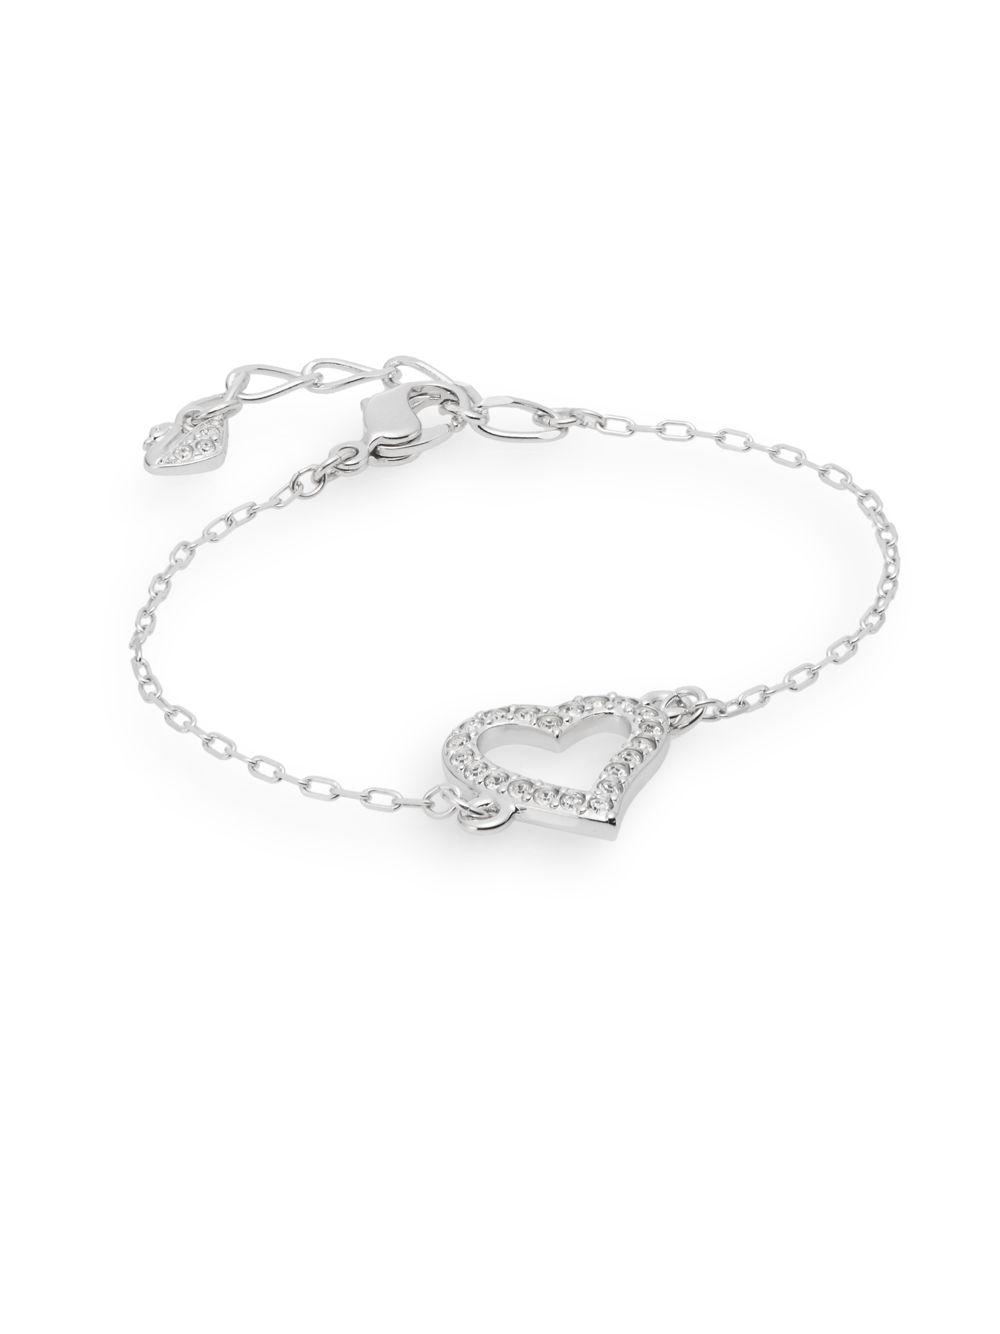 Lyst Swarovski Pave Crystal Open Heart Charm Bracelet In Metallic